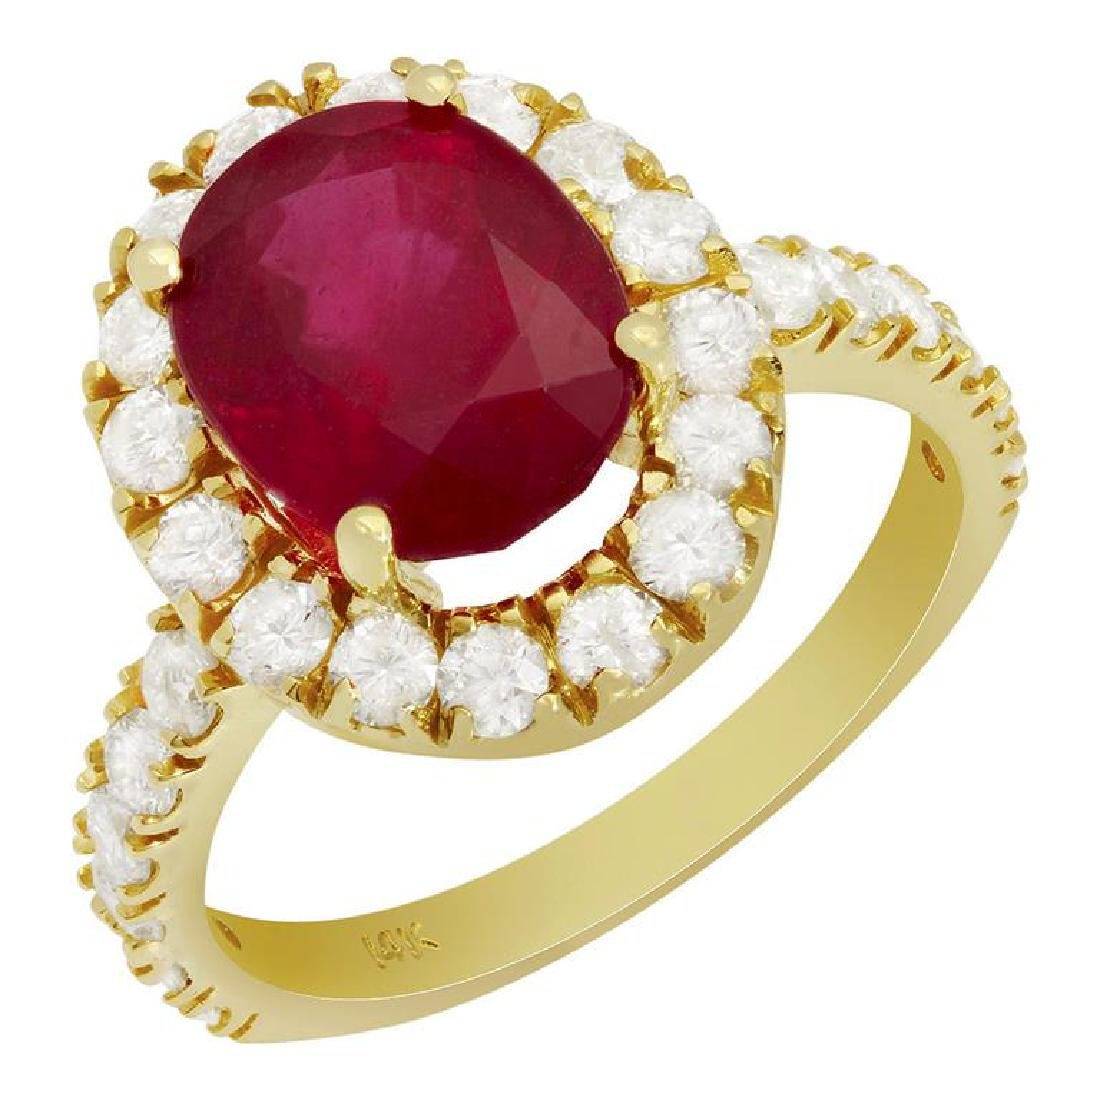 14k Yellow Gold 4.48ct Ruby 1.26ct Diamond Ring